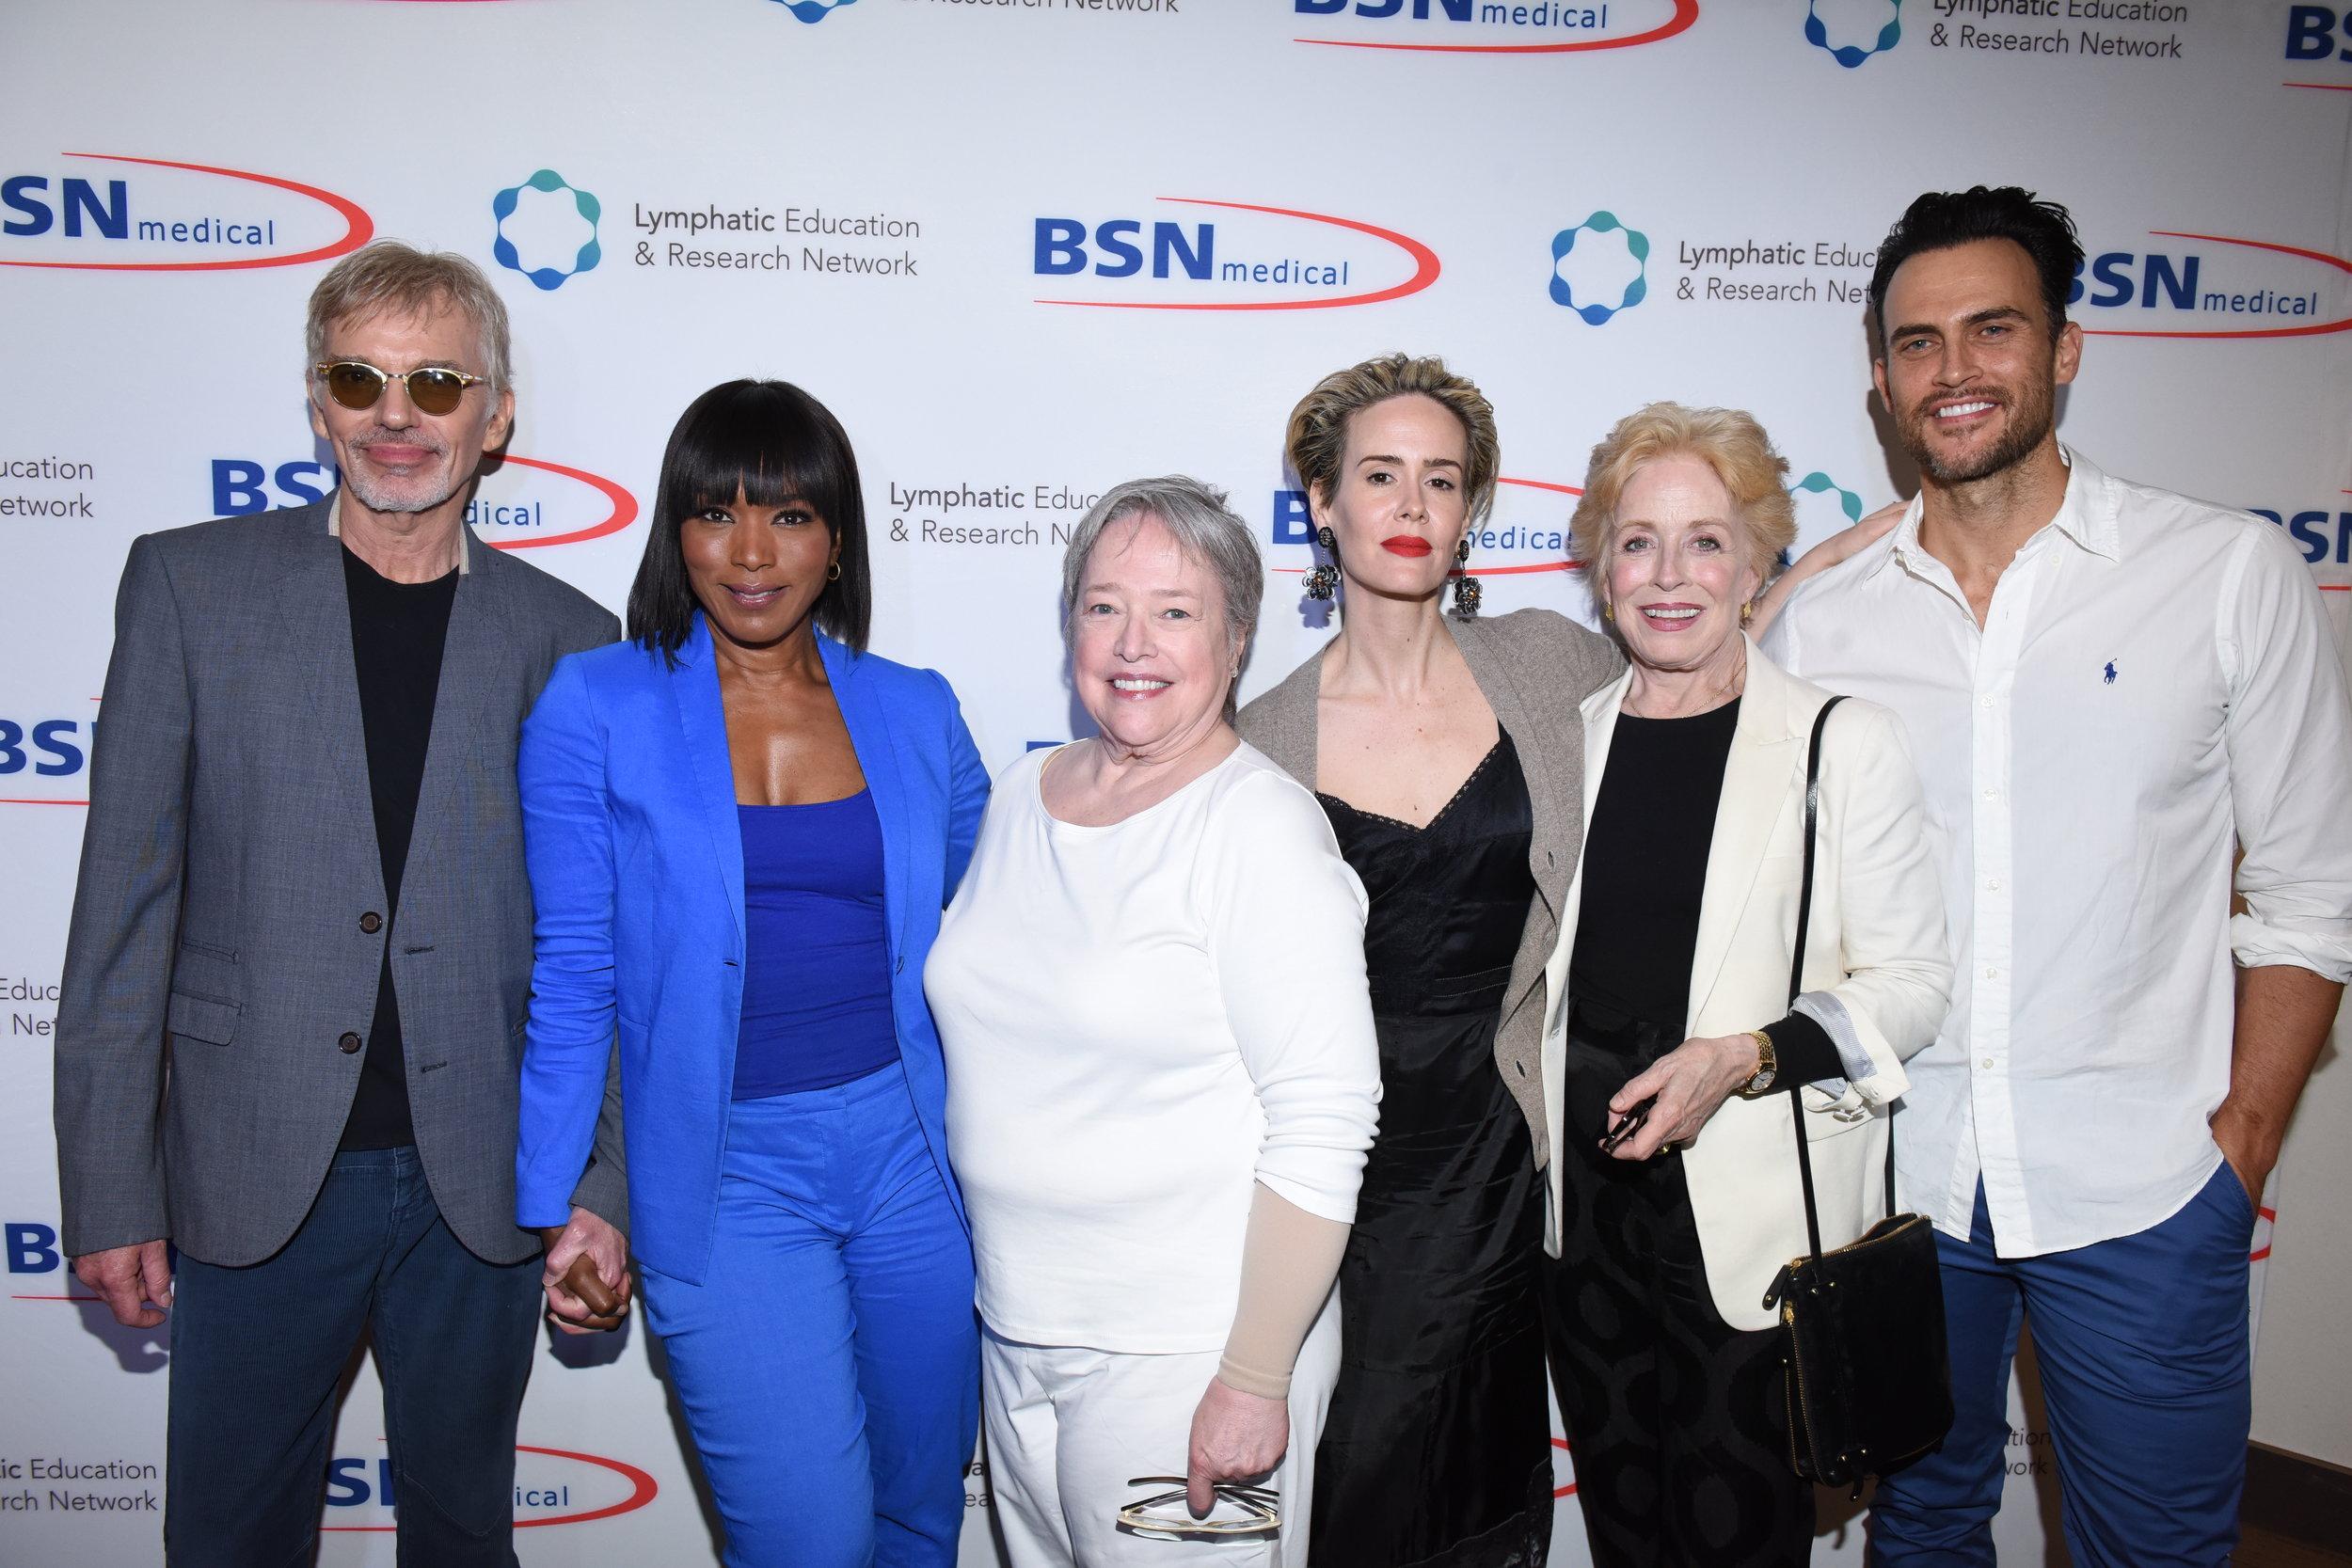 Billy Bob Thornton, Angela Bassett, Kathy Bates, Sarah Paulson, Holland Taylor & Cheyenne Jackson at LE&RN Benefit in Santa Monica, CA